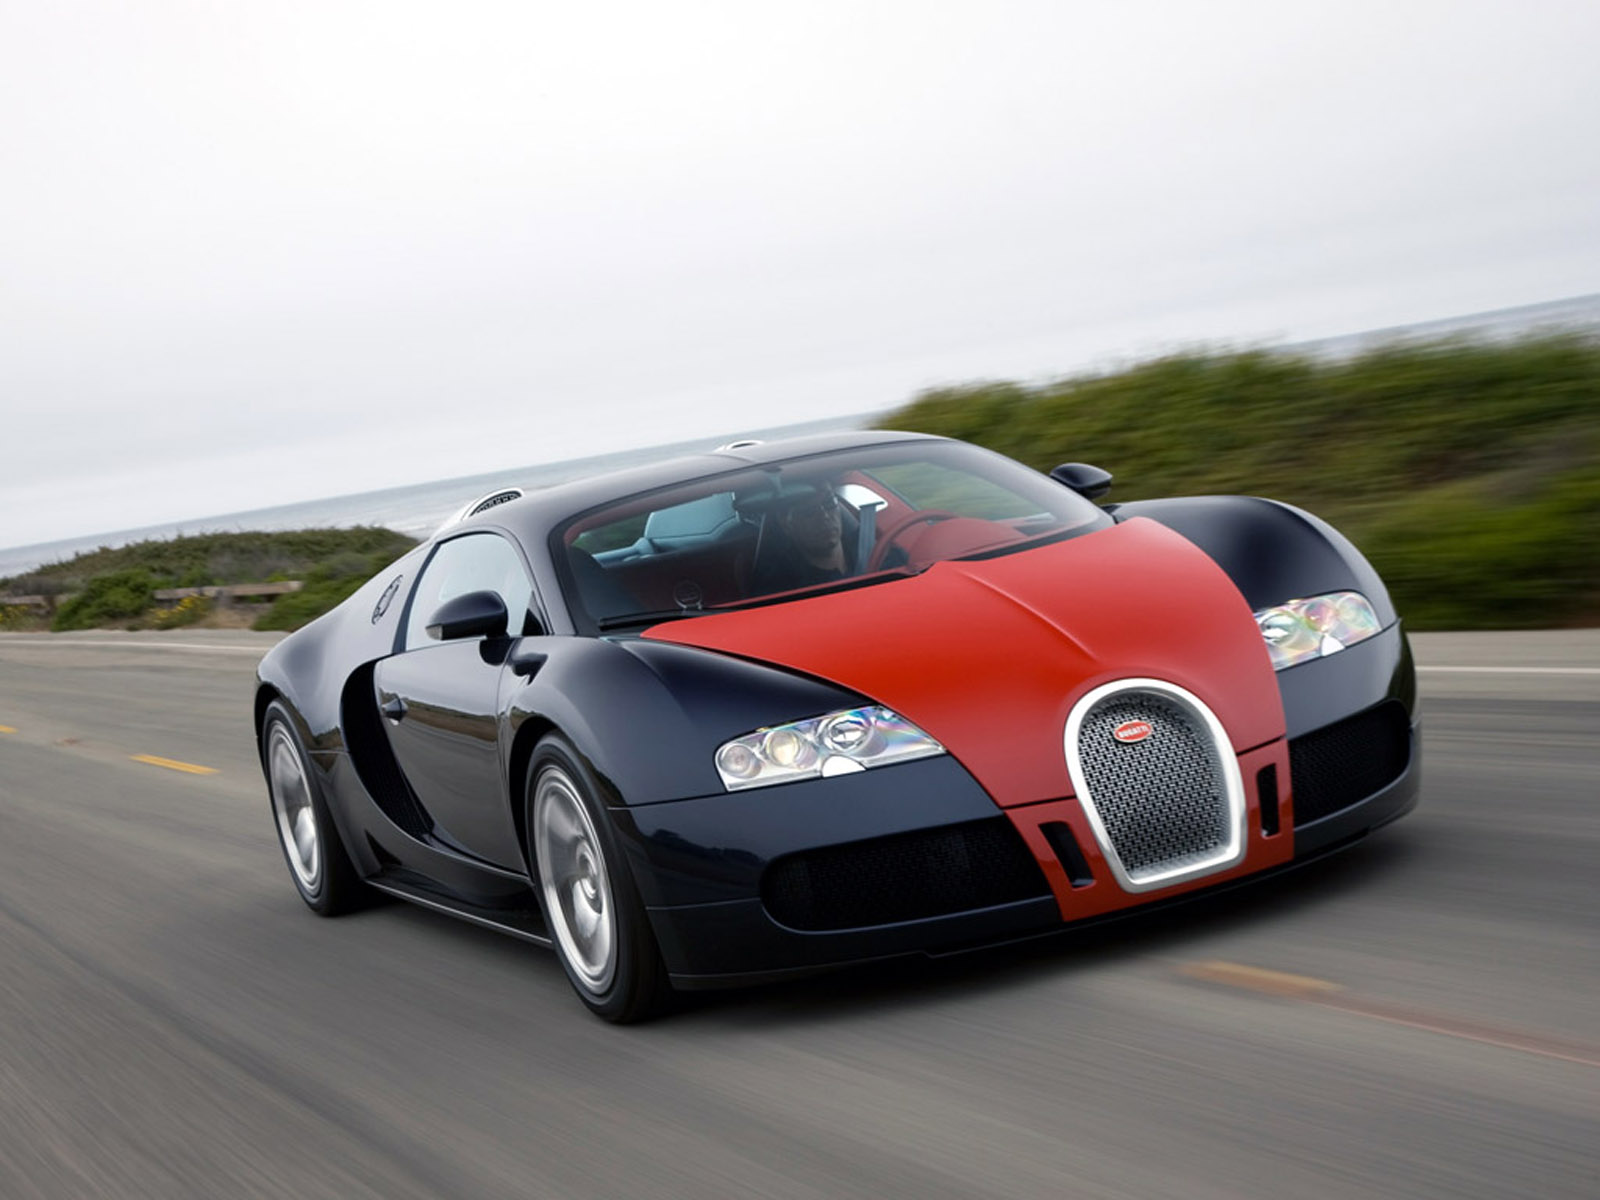 http://3.bp.blogspot.com/-UPHDJrL4ELQ/TuXx5p0azyI/AAAAAAAABZU/qjKxVNn3OYM/s1600/Bugatti+Veyron.jpg